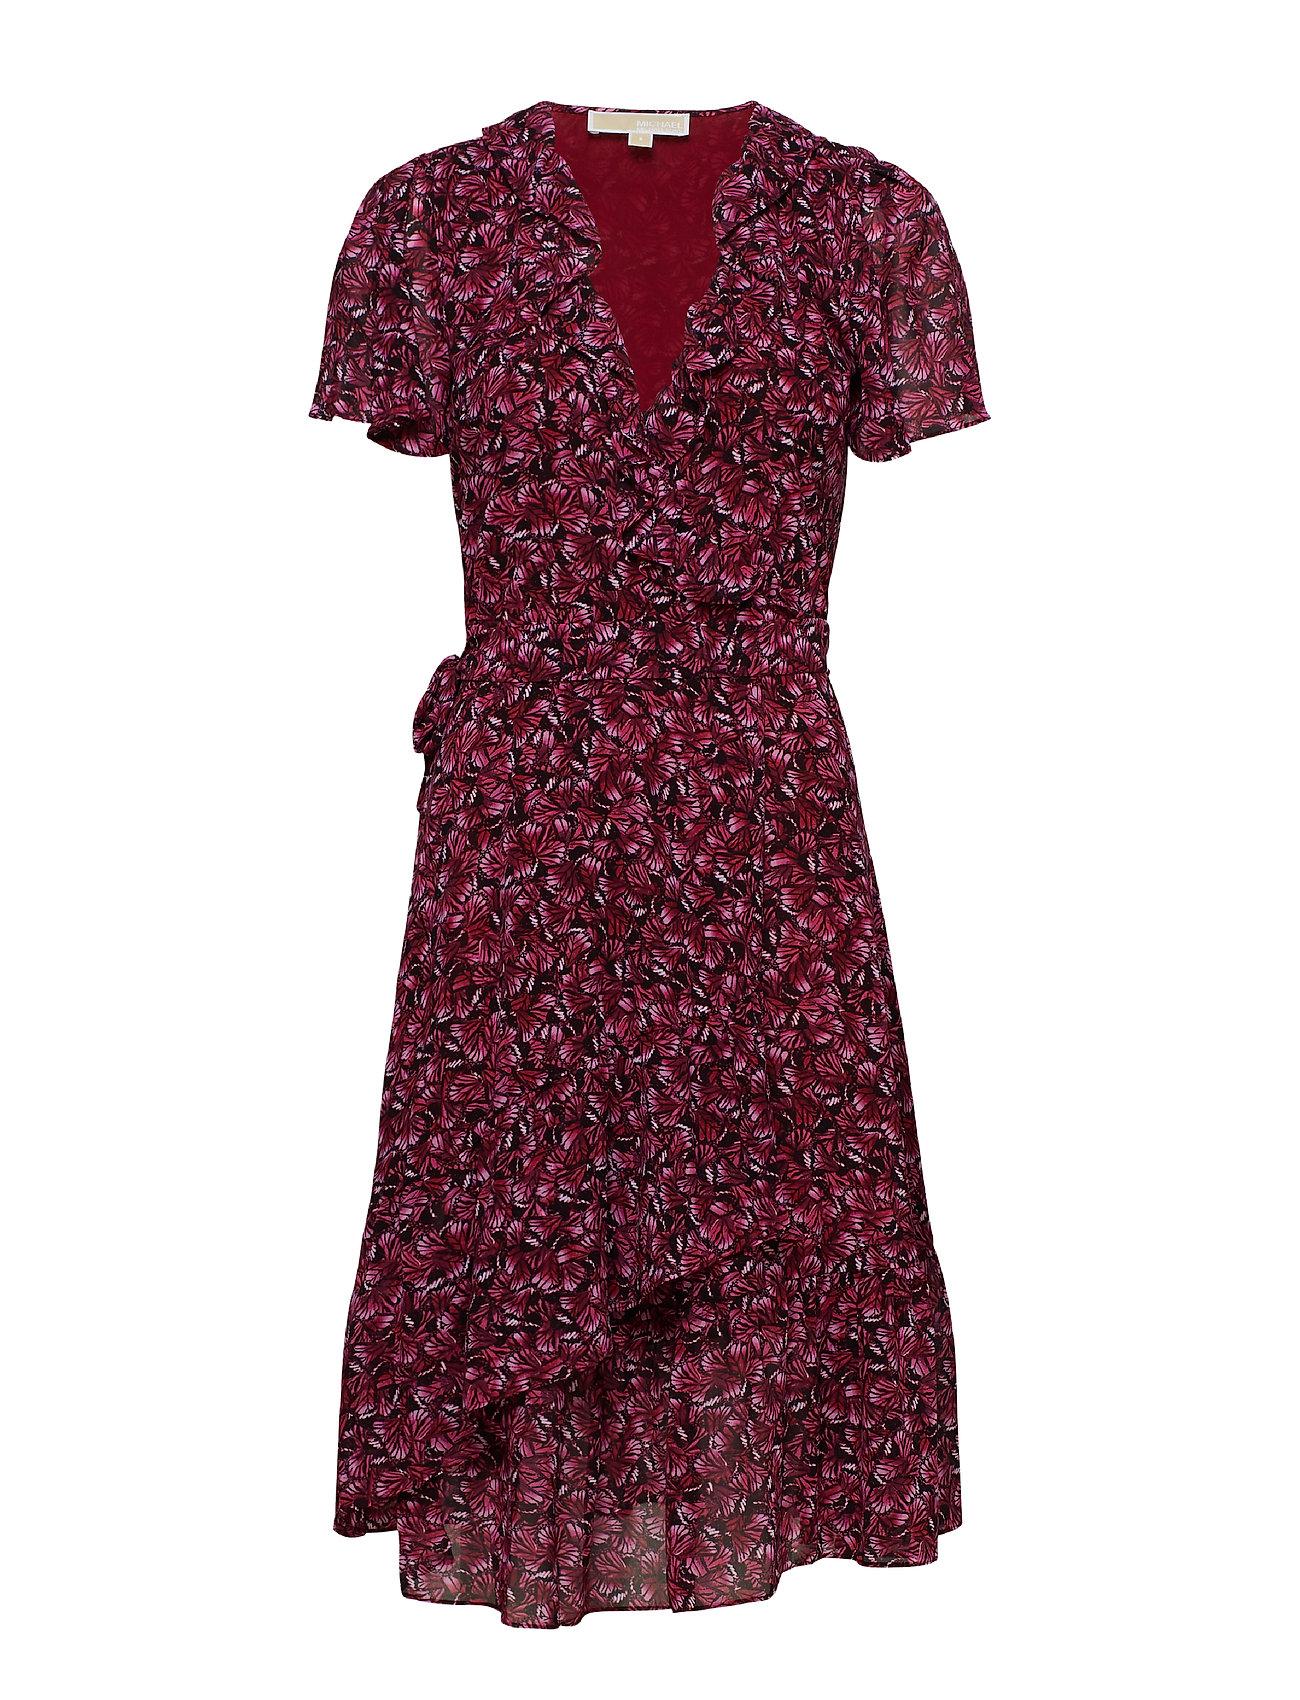 Image of Gd Papillom Wrap Dres (3140154803)